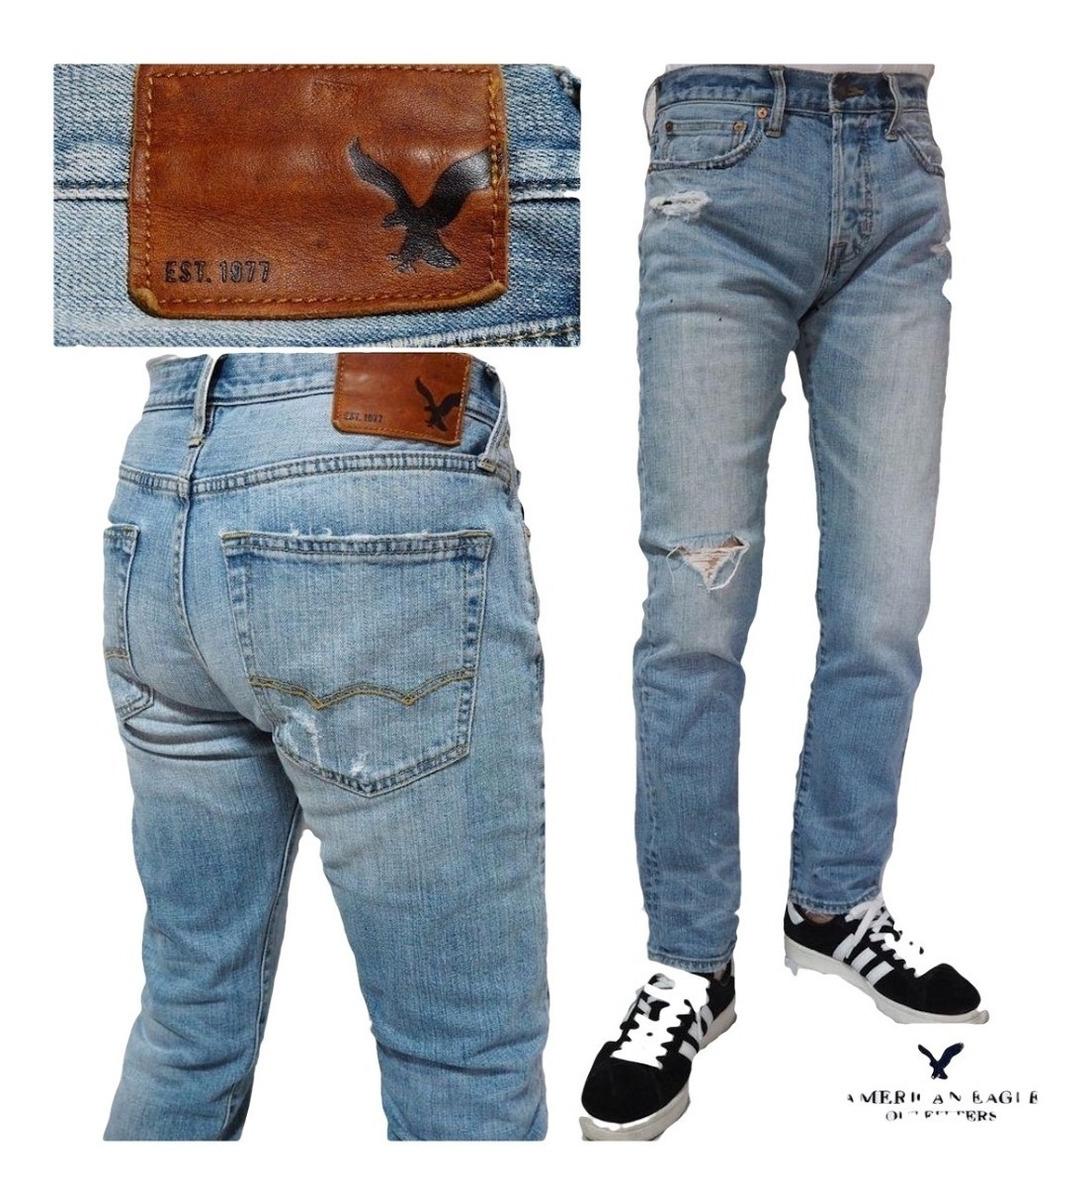 Pantalon Vaquero American Eagle Jeans Talle 30x32 Original